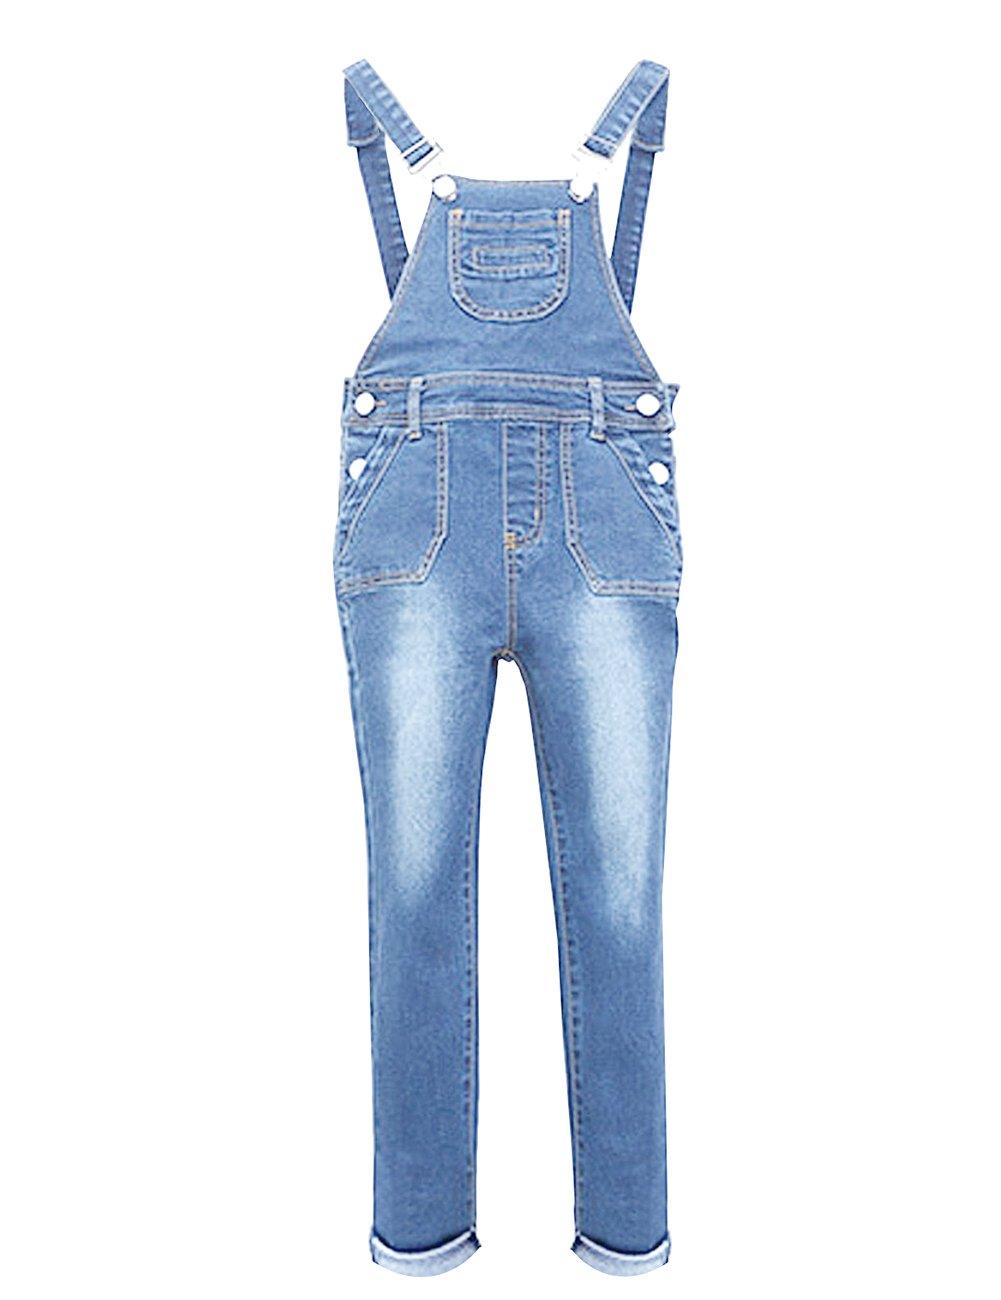 YJ.GWL Girls Denim Overalls(Light Blue,160)